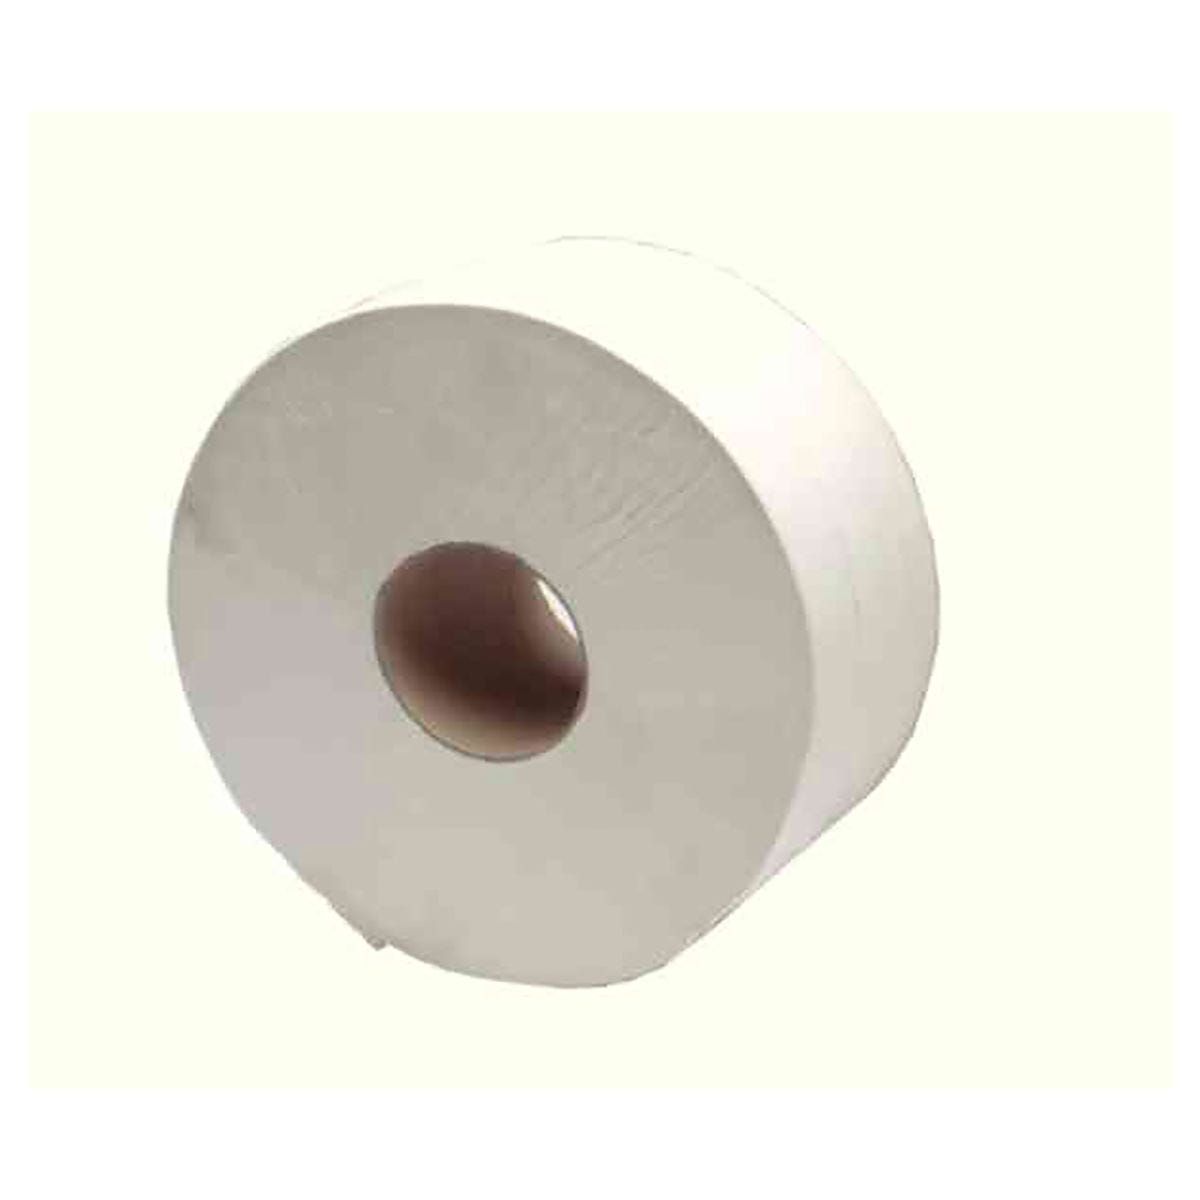 Image of 2Work White Jumbo 2 Ply Toilet Roll 410 Metre Pack of 6